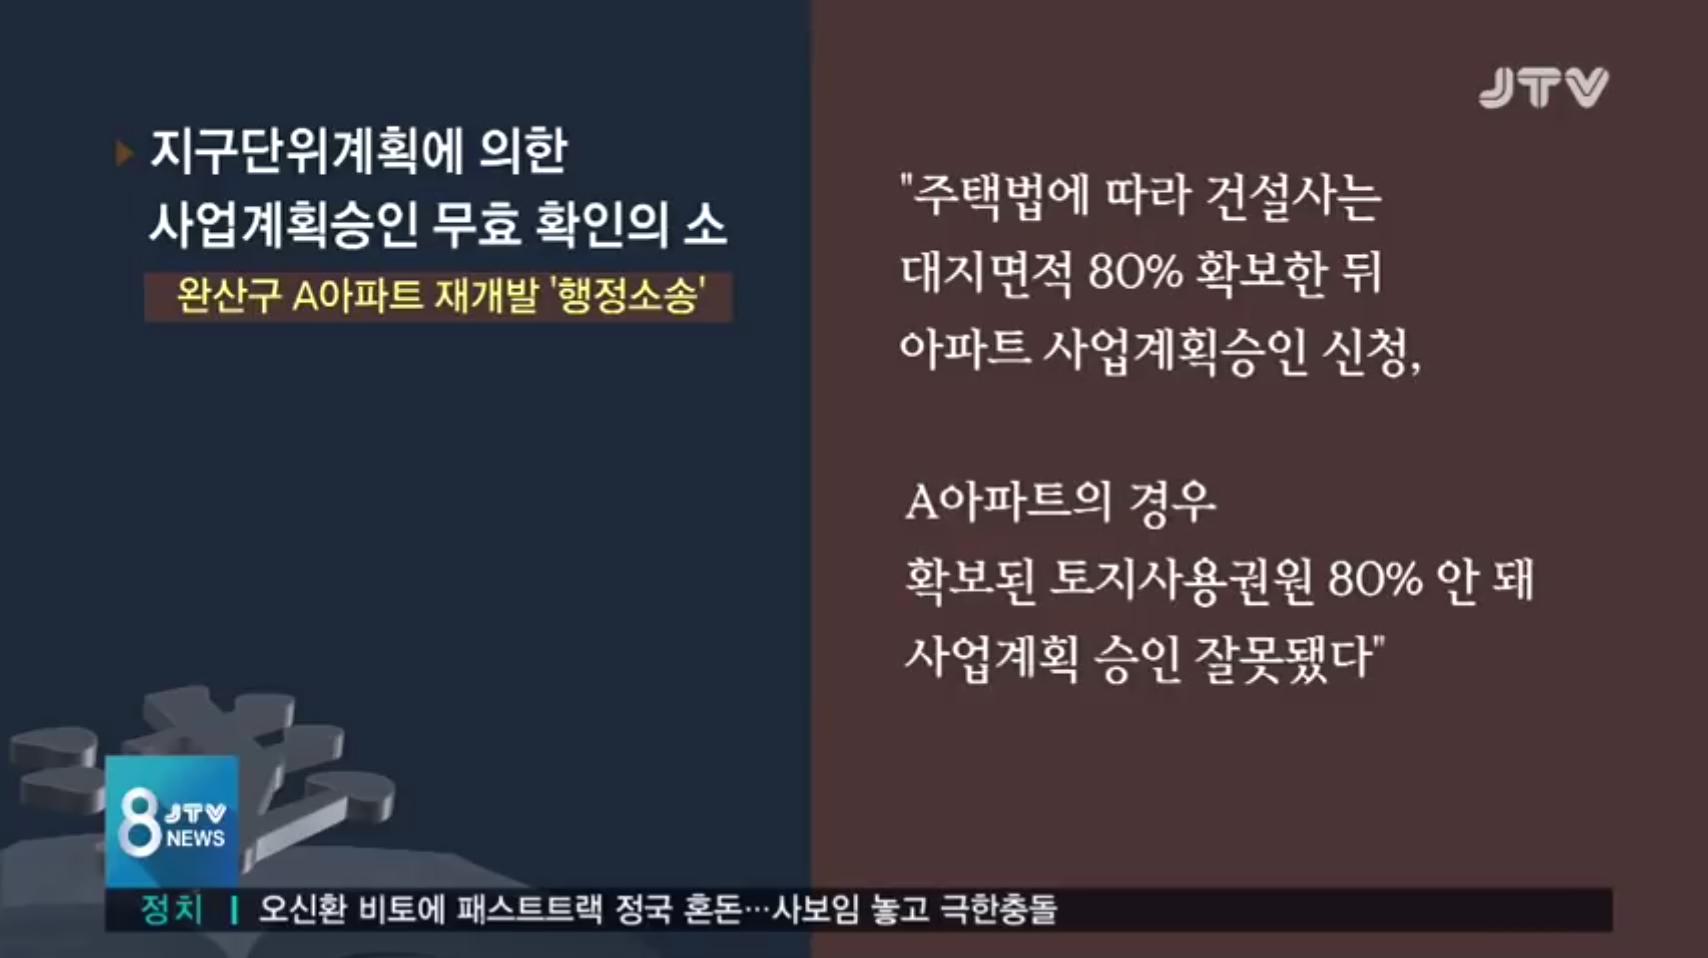 [19.4.24 JTV] 전주시, 아파트재개발 승인 허술, 정보공개 거부로 시민만 골탕3.png